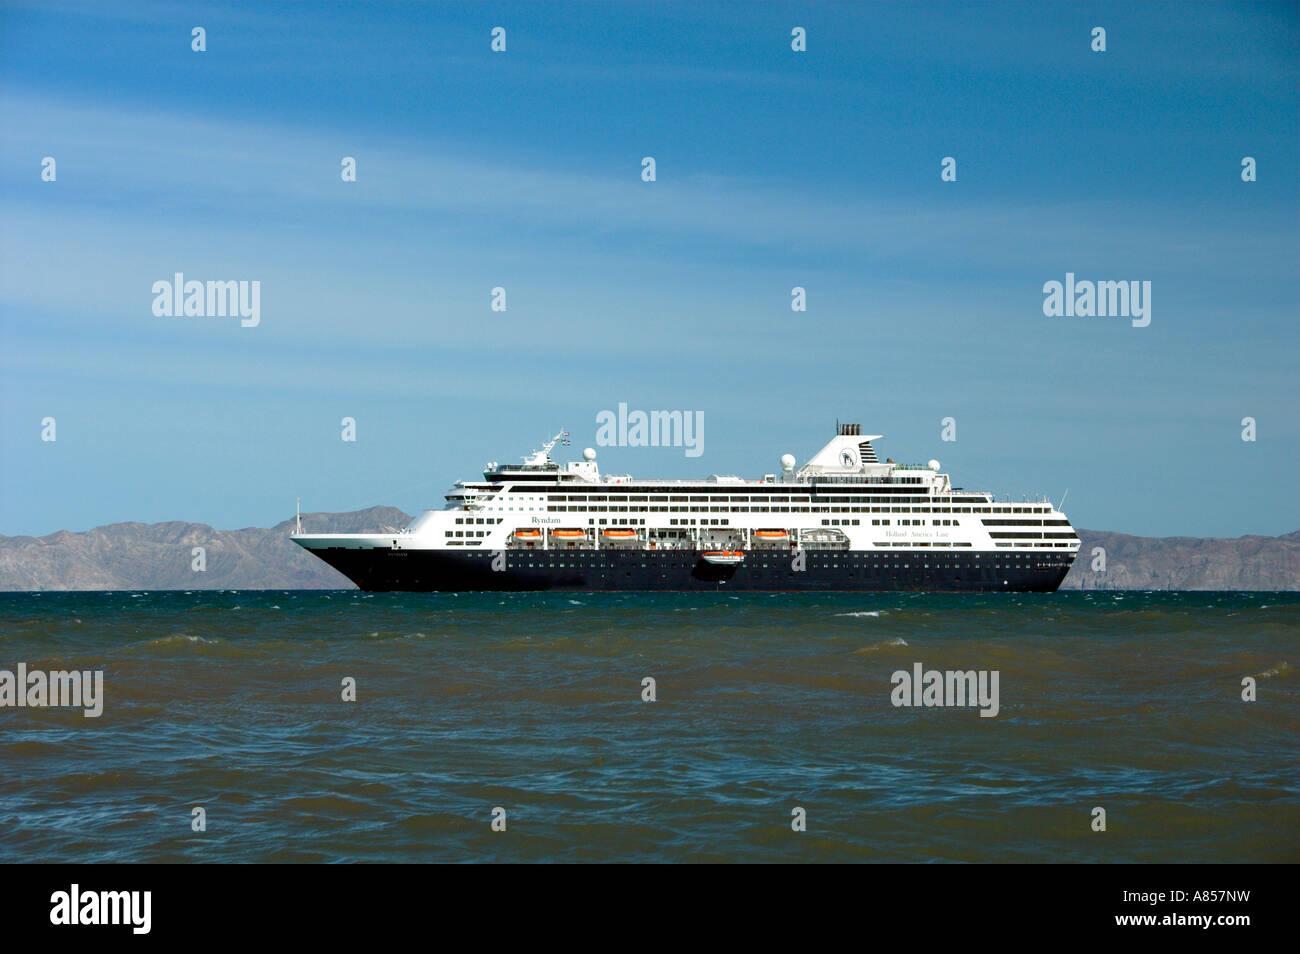 The Holland America cruise ship Ryndam anchored off the coast at the Baja Sur port of Loreto Mexico Stock Photo